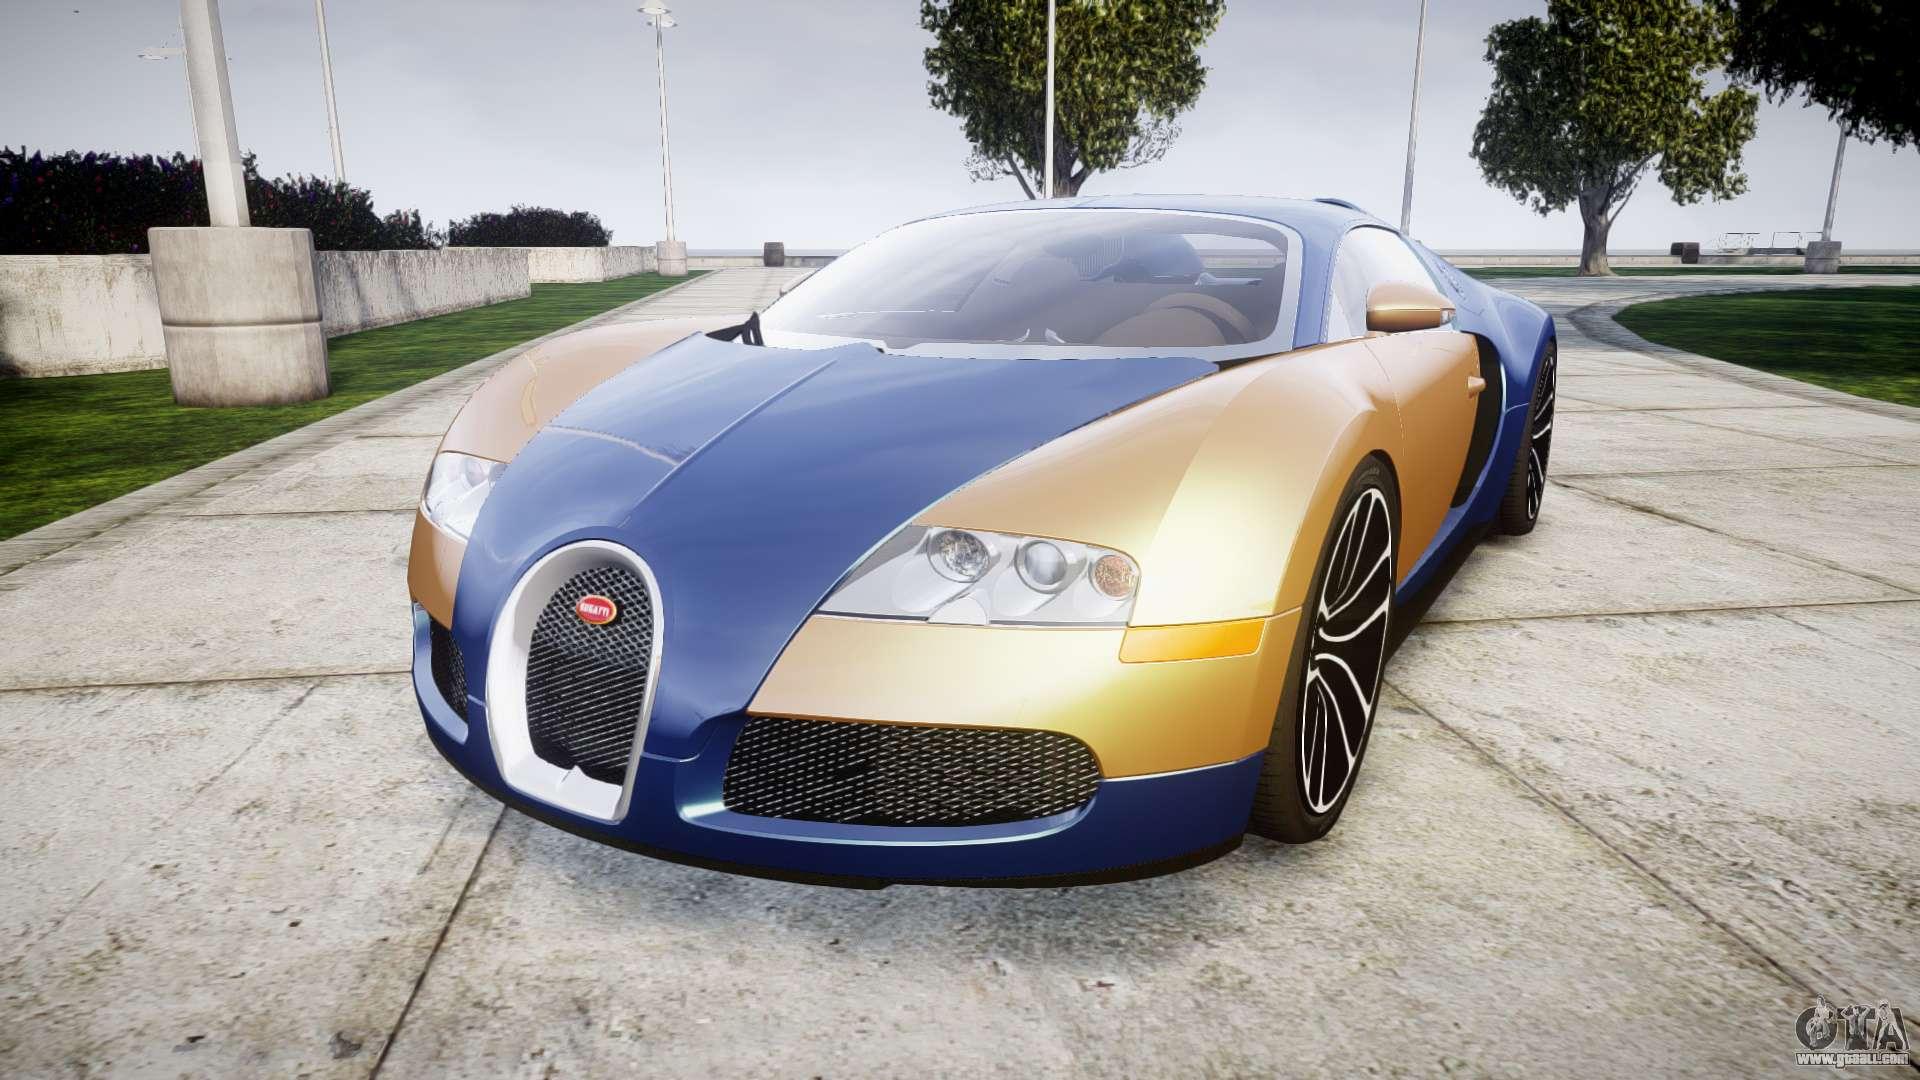 232217-GTAIV-2014-11-26-20-45-07-761 Wonderful Bugatti Veyron Xbox 360 Games Cars Trend